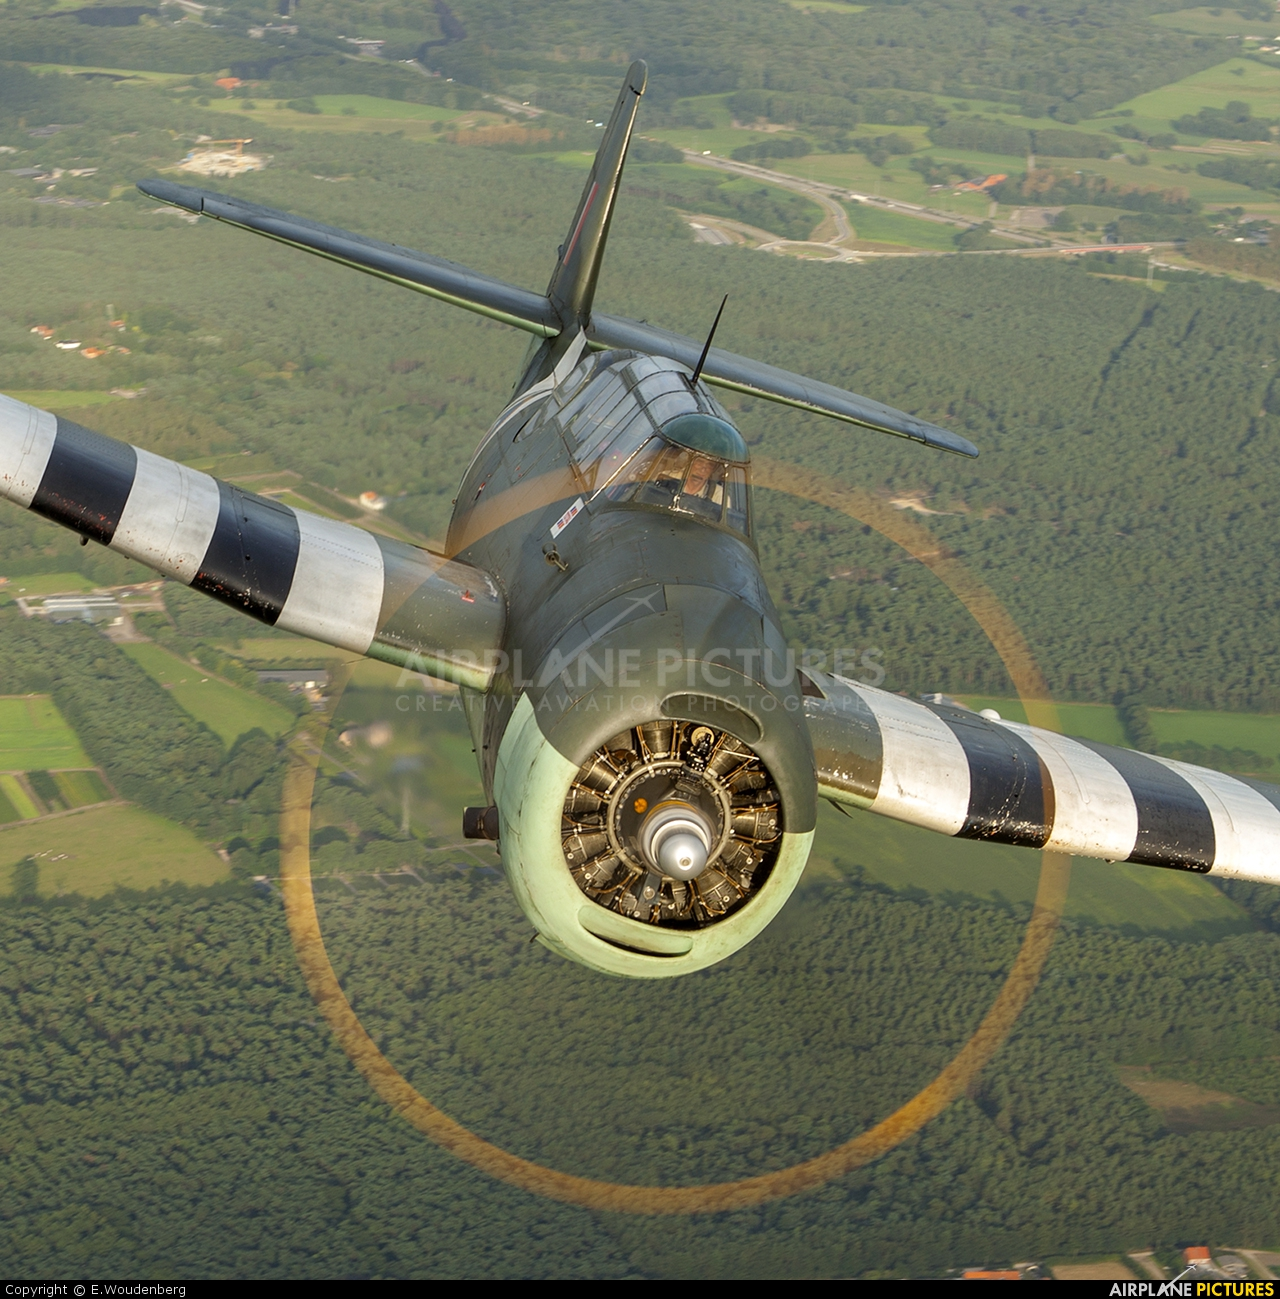 Private F-AZJA aircraft at In Flight - Belgium